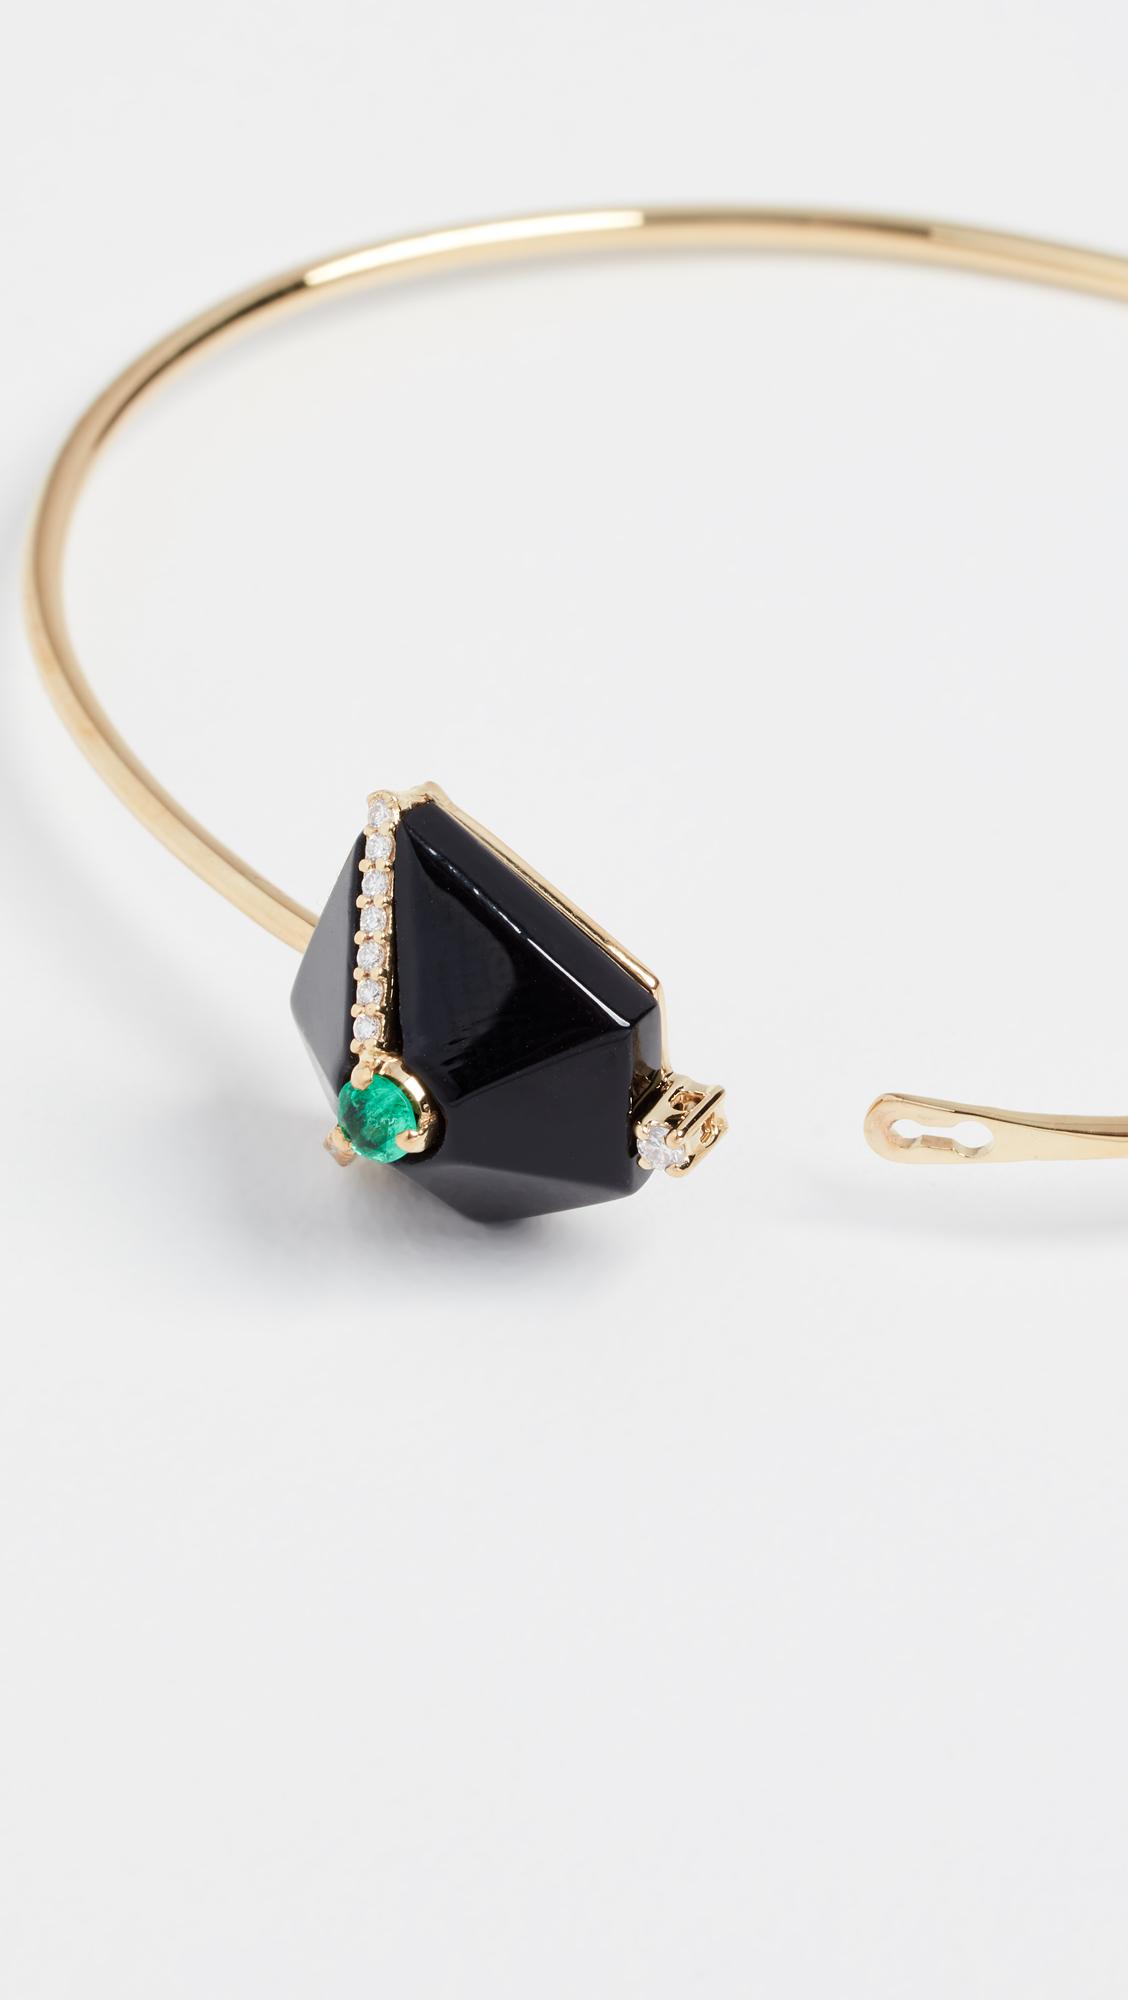 Tana Chung 18k Gold Cuore Bracelet eSOt3